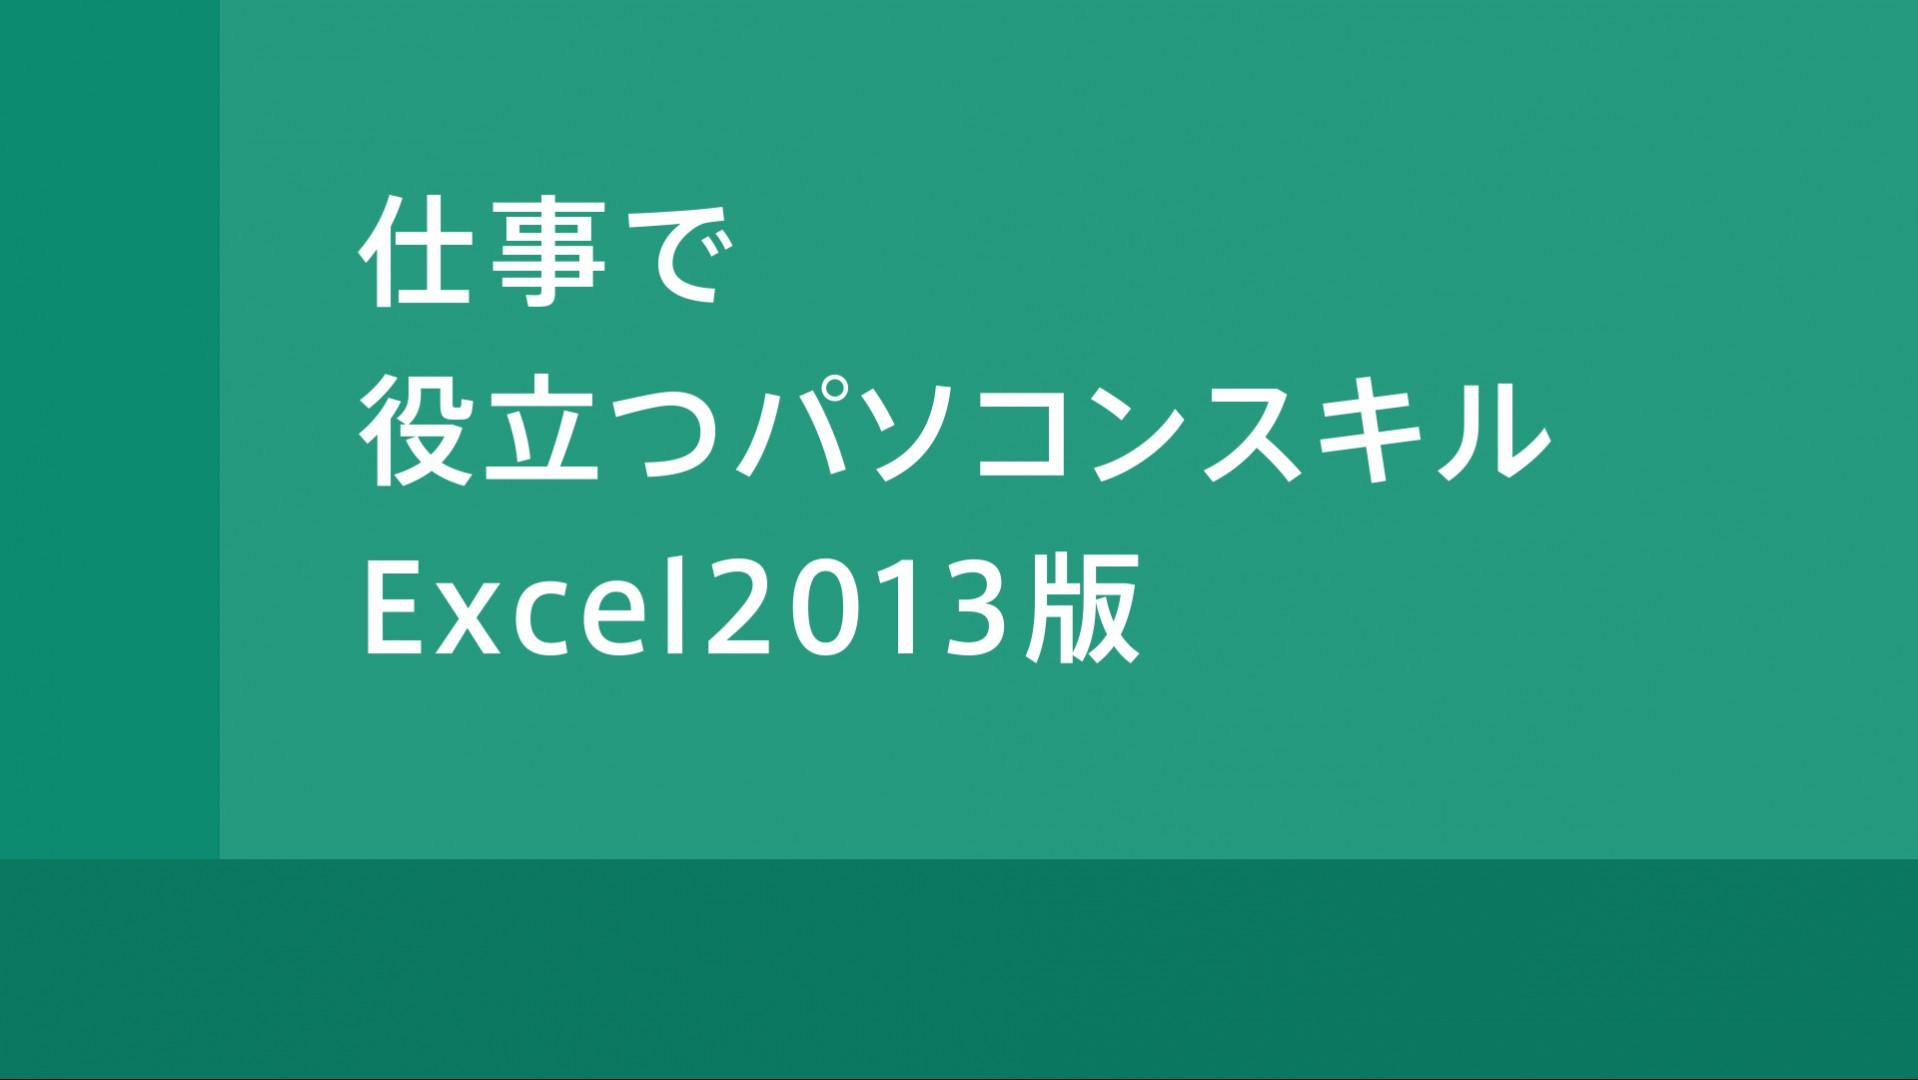 Excel2013 列や行ごとに全角か半角かを自動的に切り替える